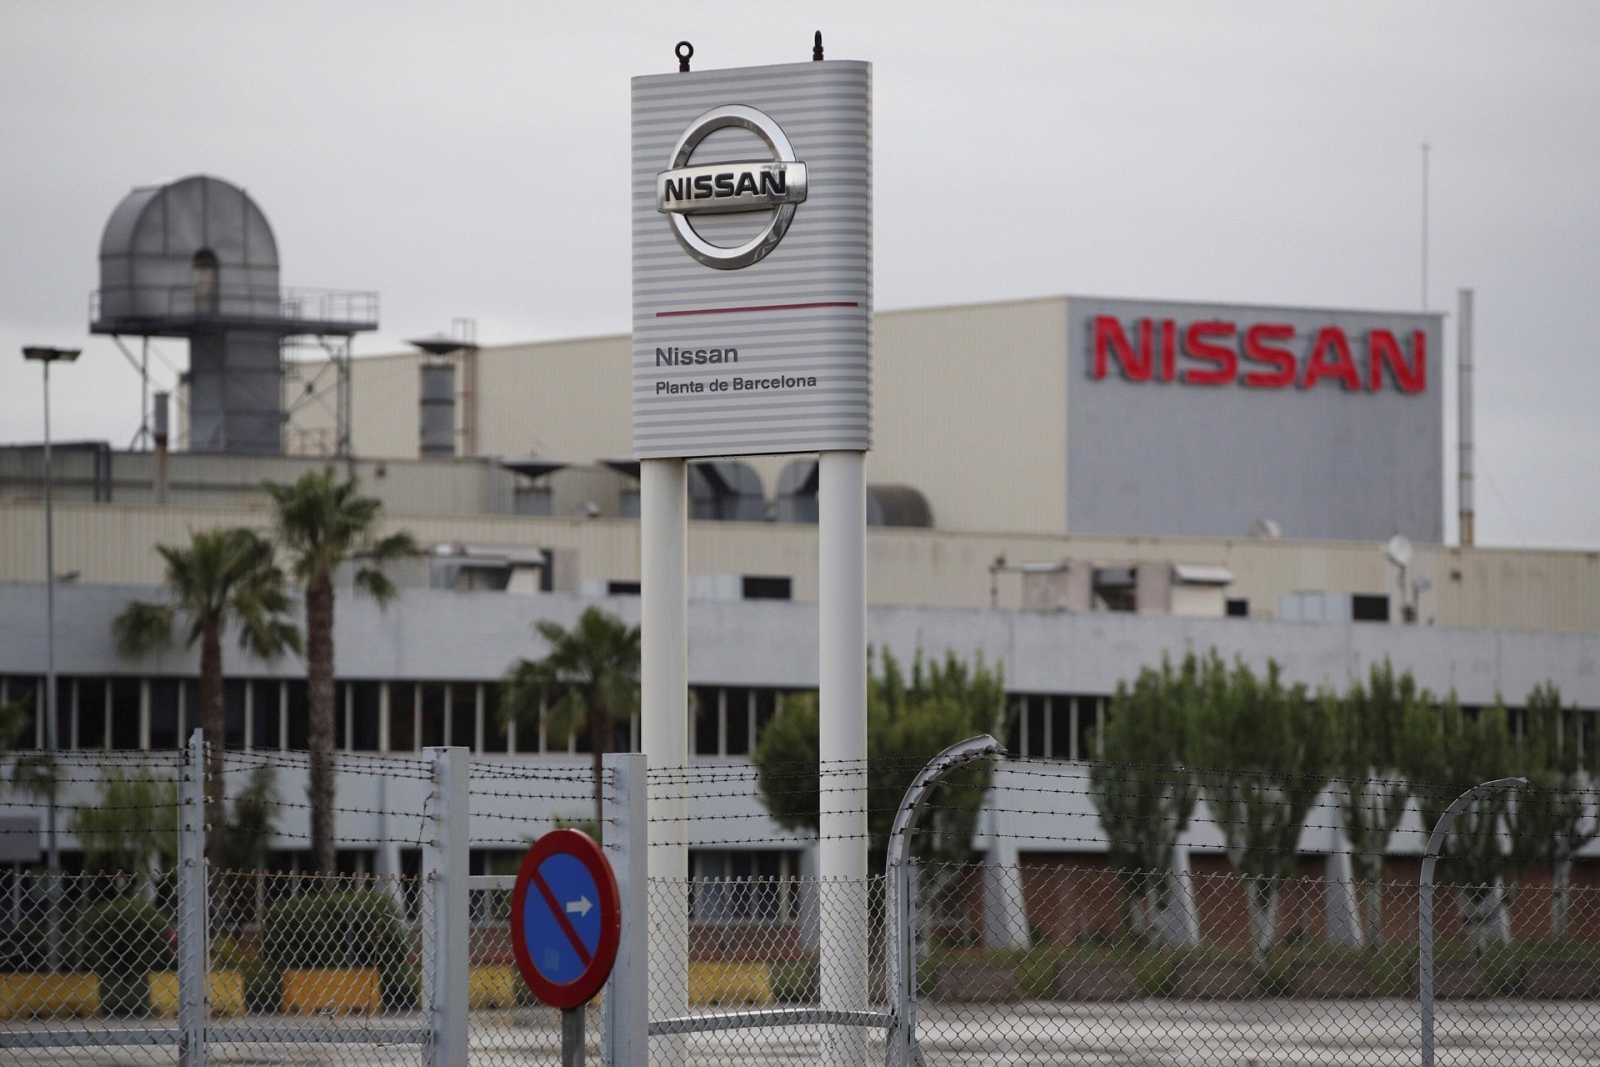 Vista exterior de la planta de Nissan en la zona franca de Barcelona